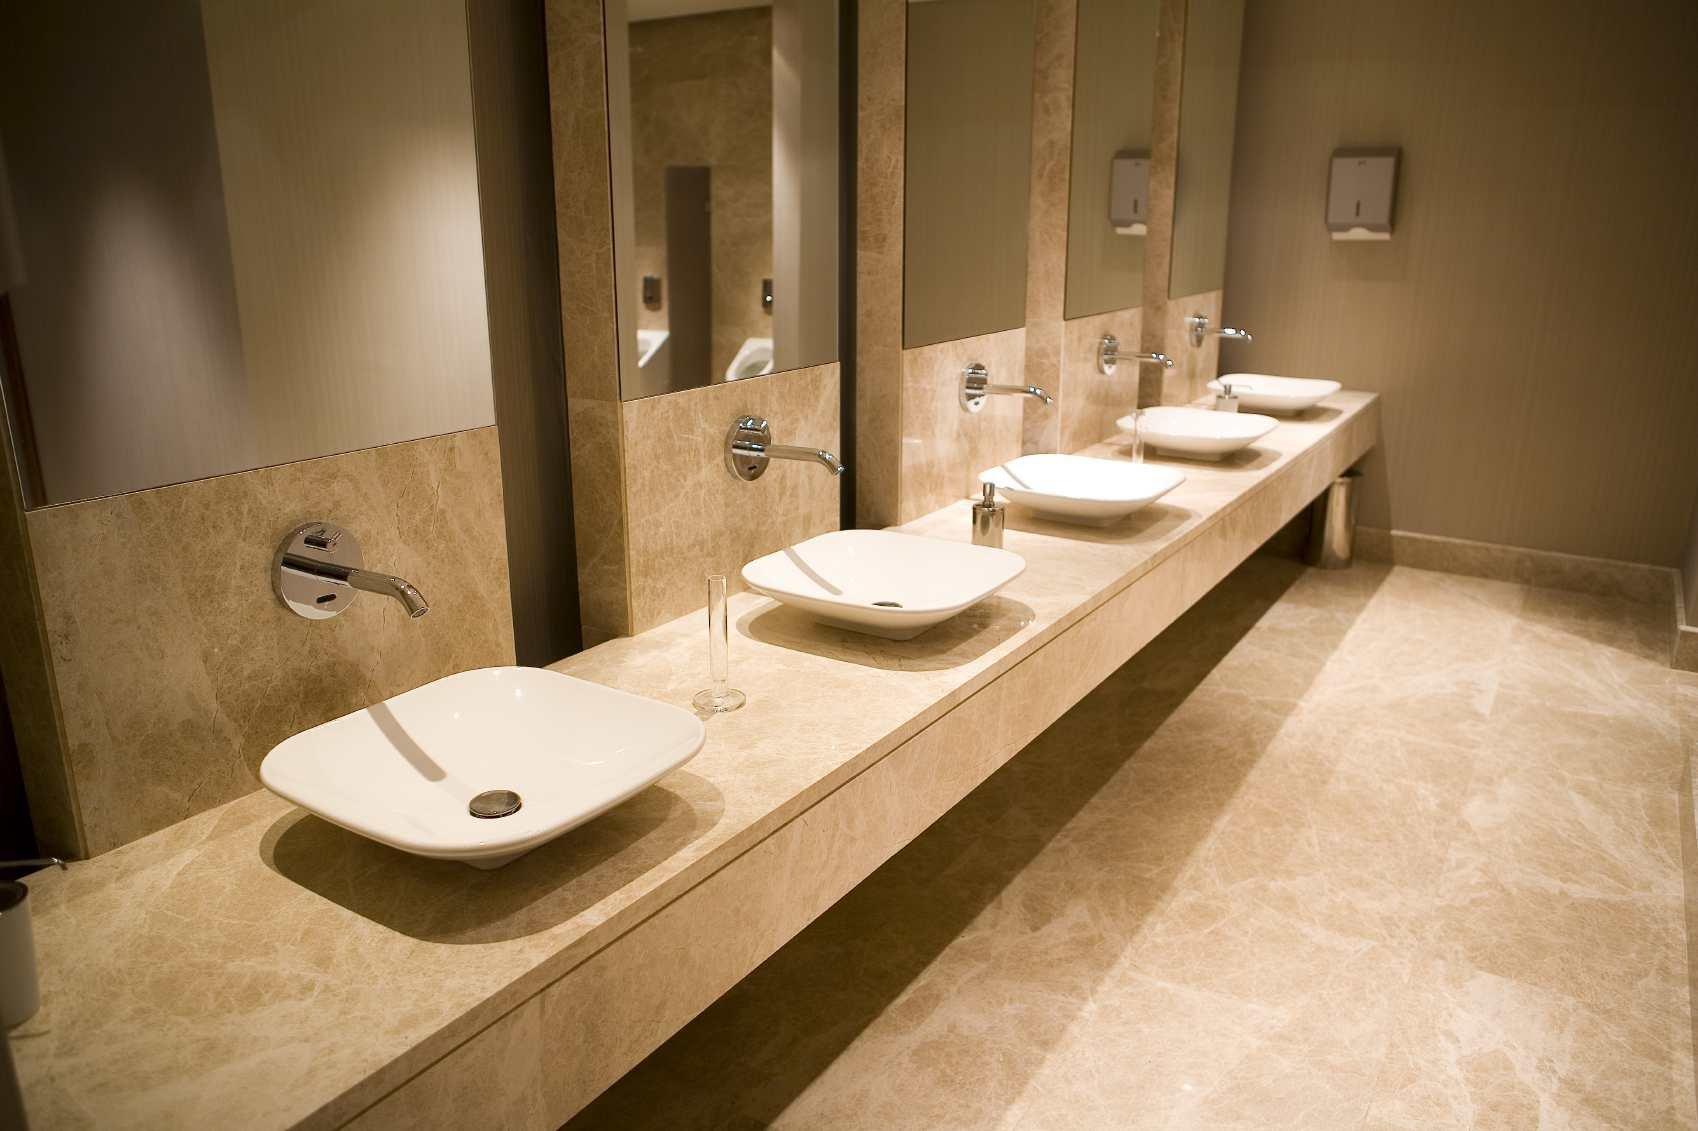 commercial-automatic-motion-faucets-public_bathroom